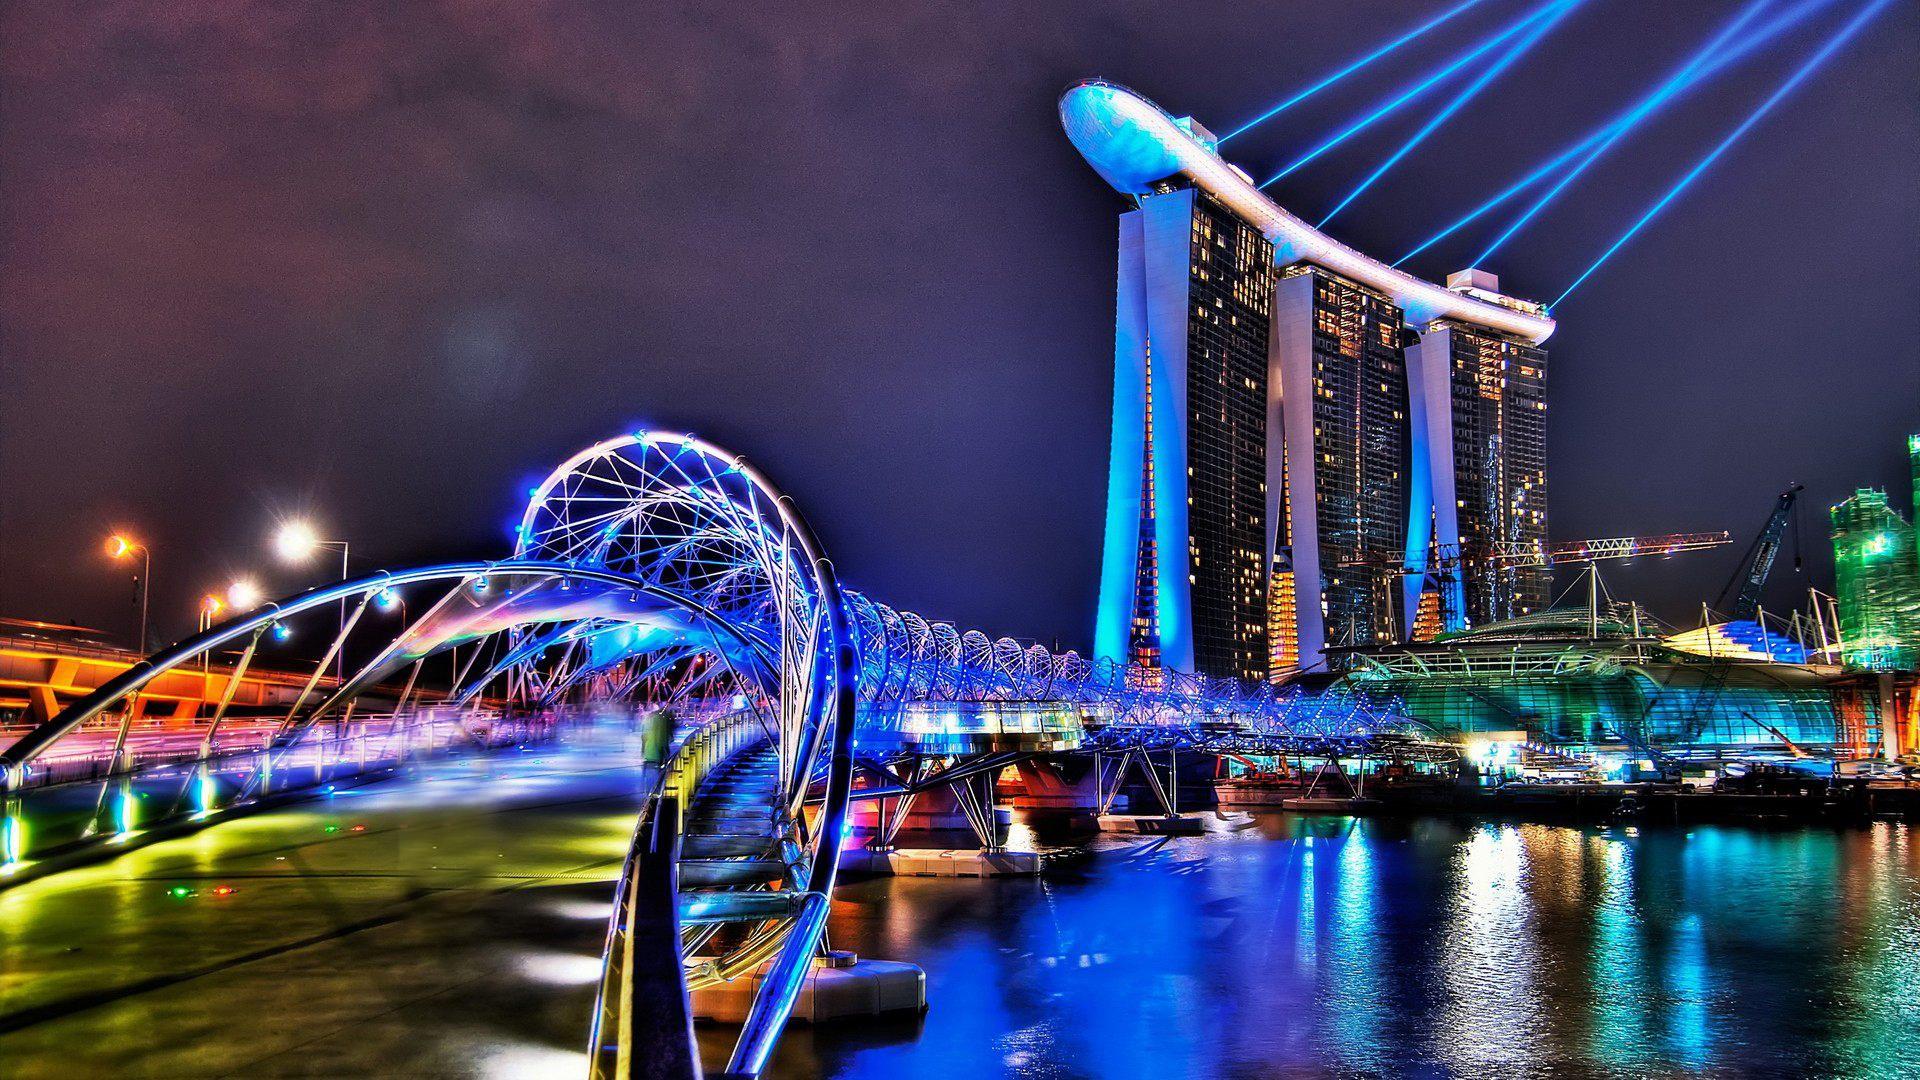 Du lich tu tuc Singapore va tat ca kinh nghiem phai biet hinh anh 14